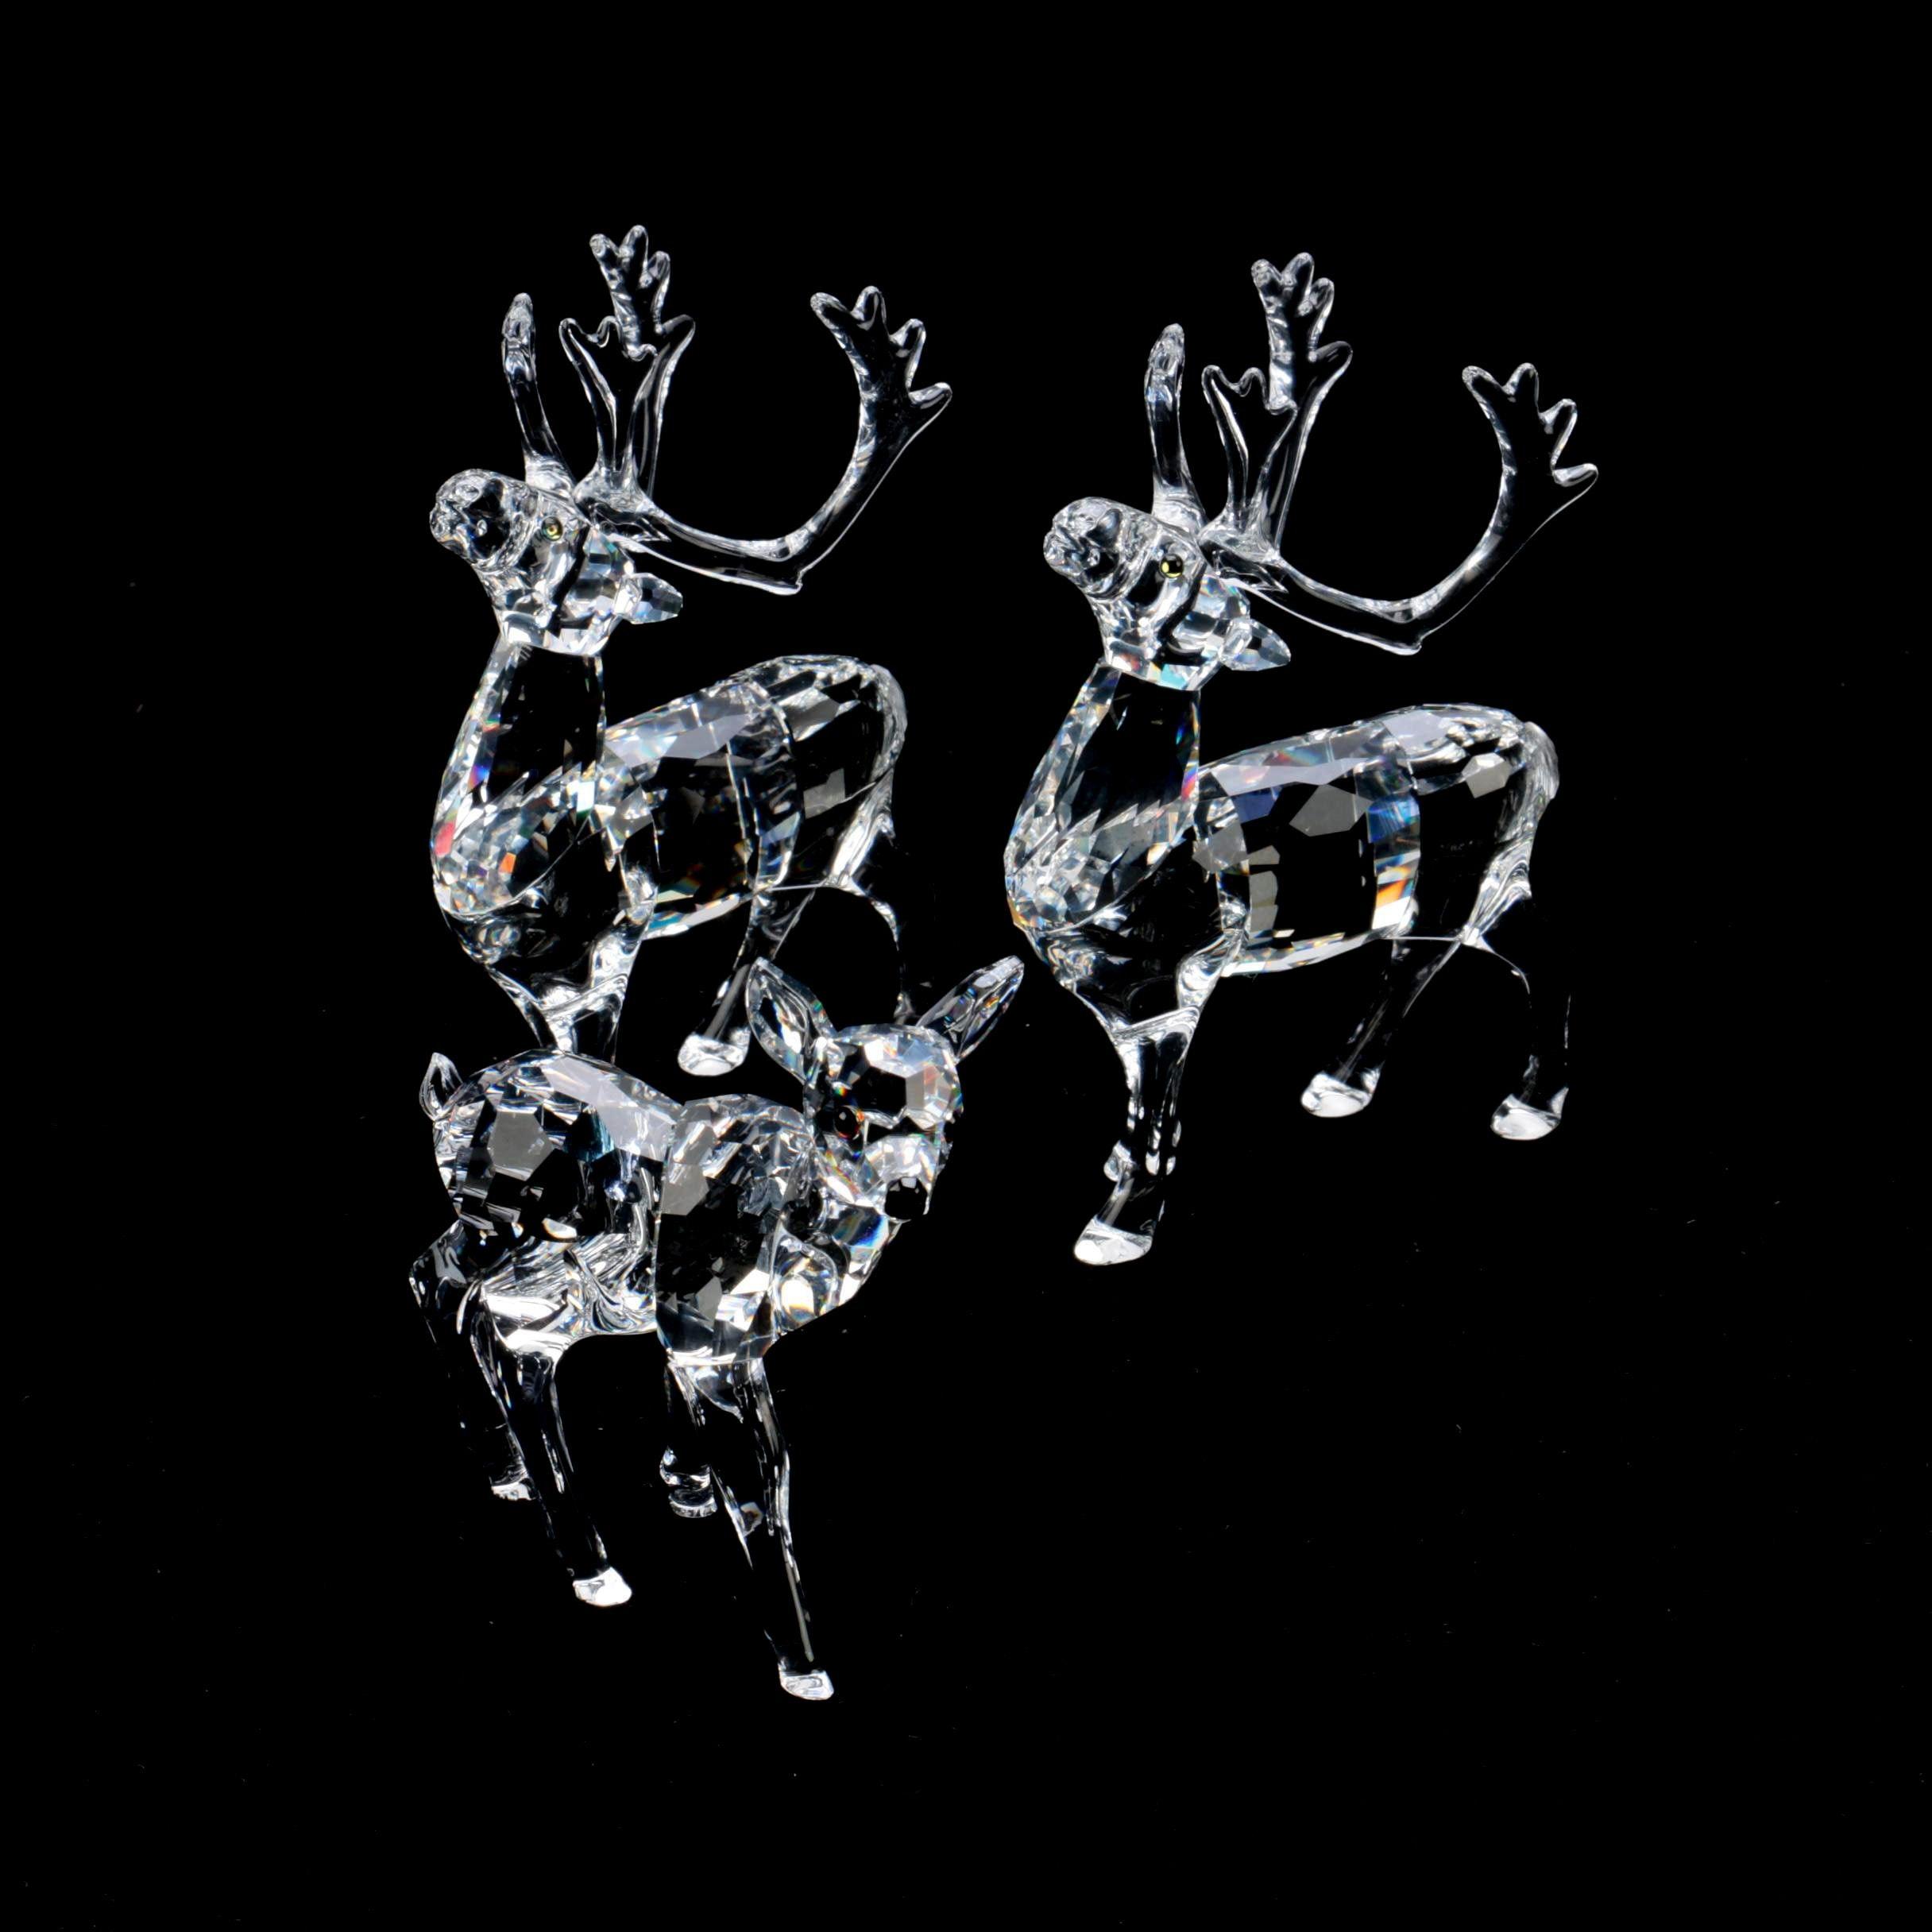 Swarovski Crystal Fawn and Reindeer Figurines